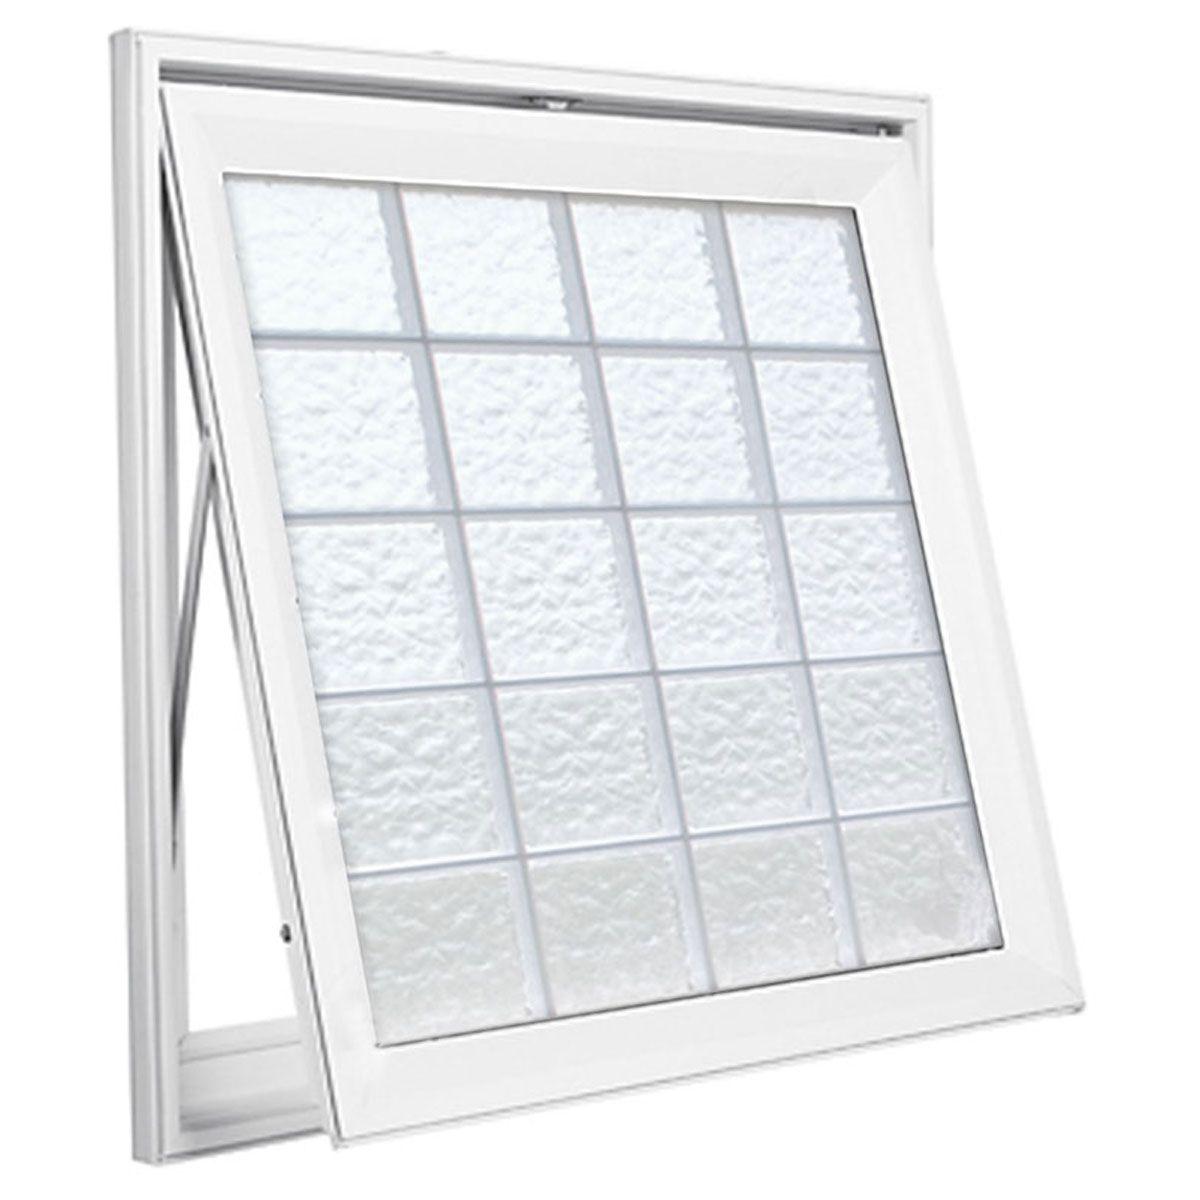 Design Series Awning Windows 6 Inch X 6 Inch X 1 1 2 Inch Blocks Awning Windows Window In Shower Glass Block Windows